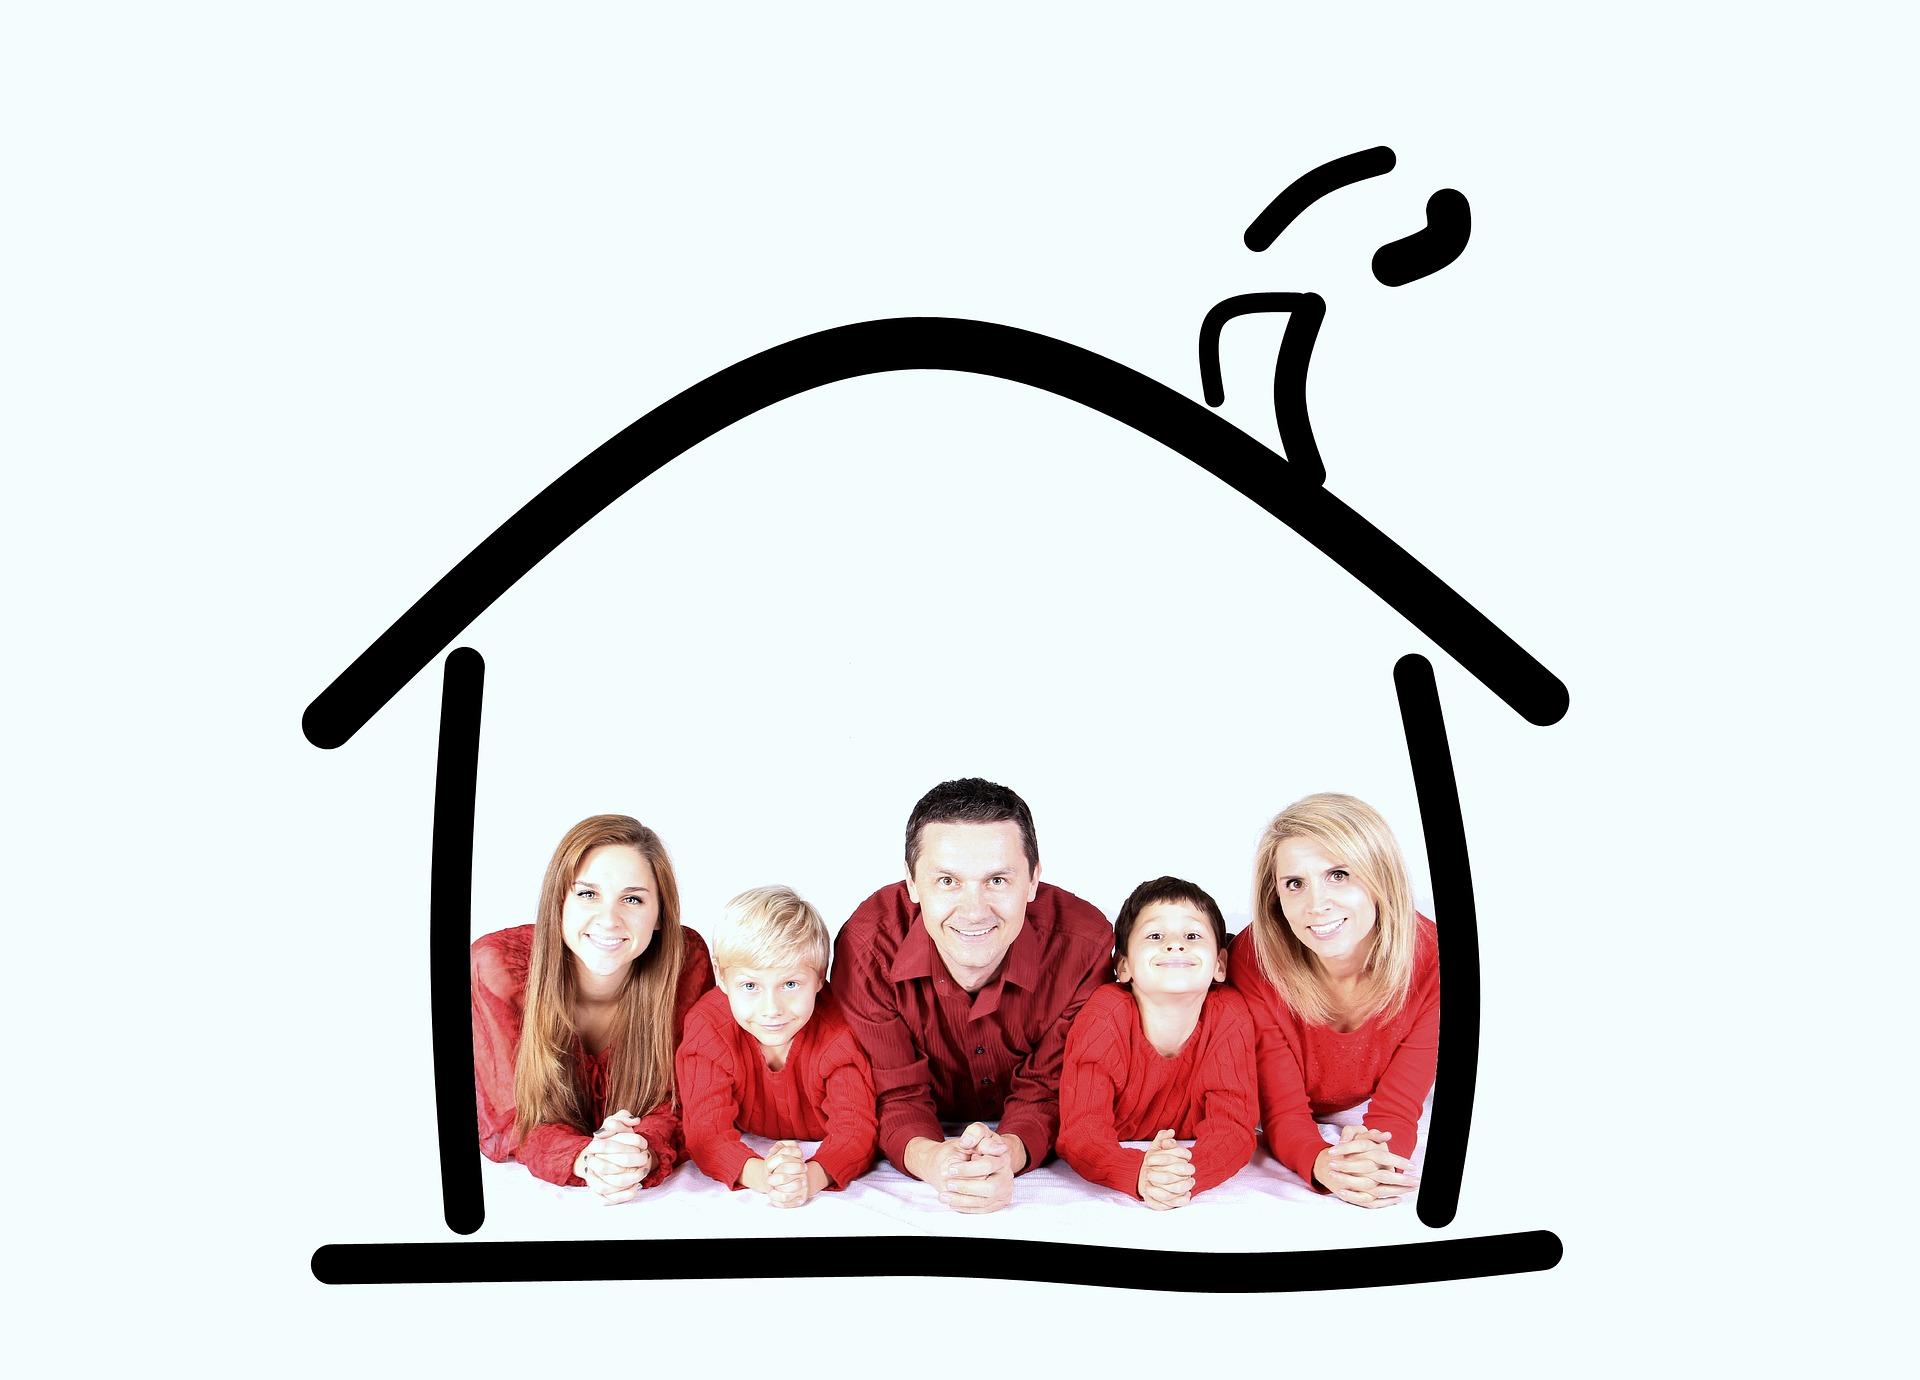 Logo buscador de servicios inmobiliarios youliacom